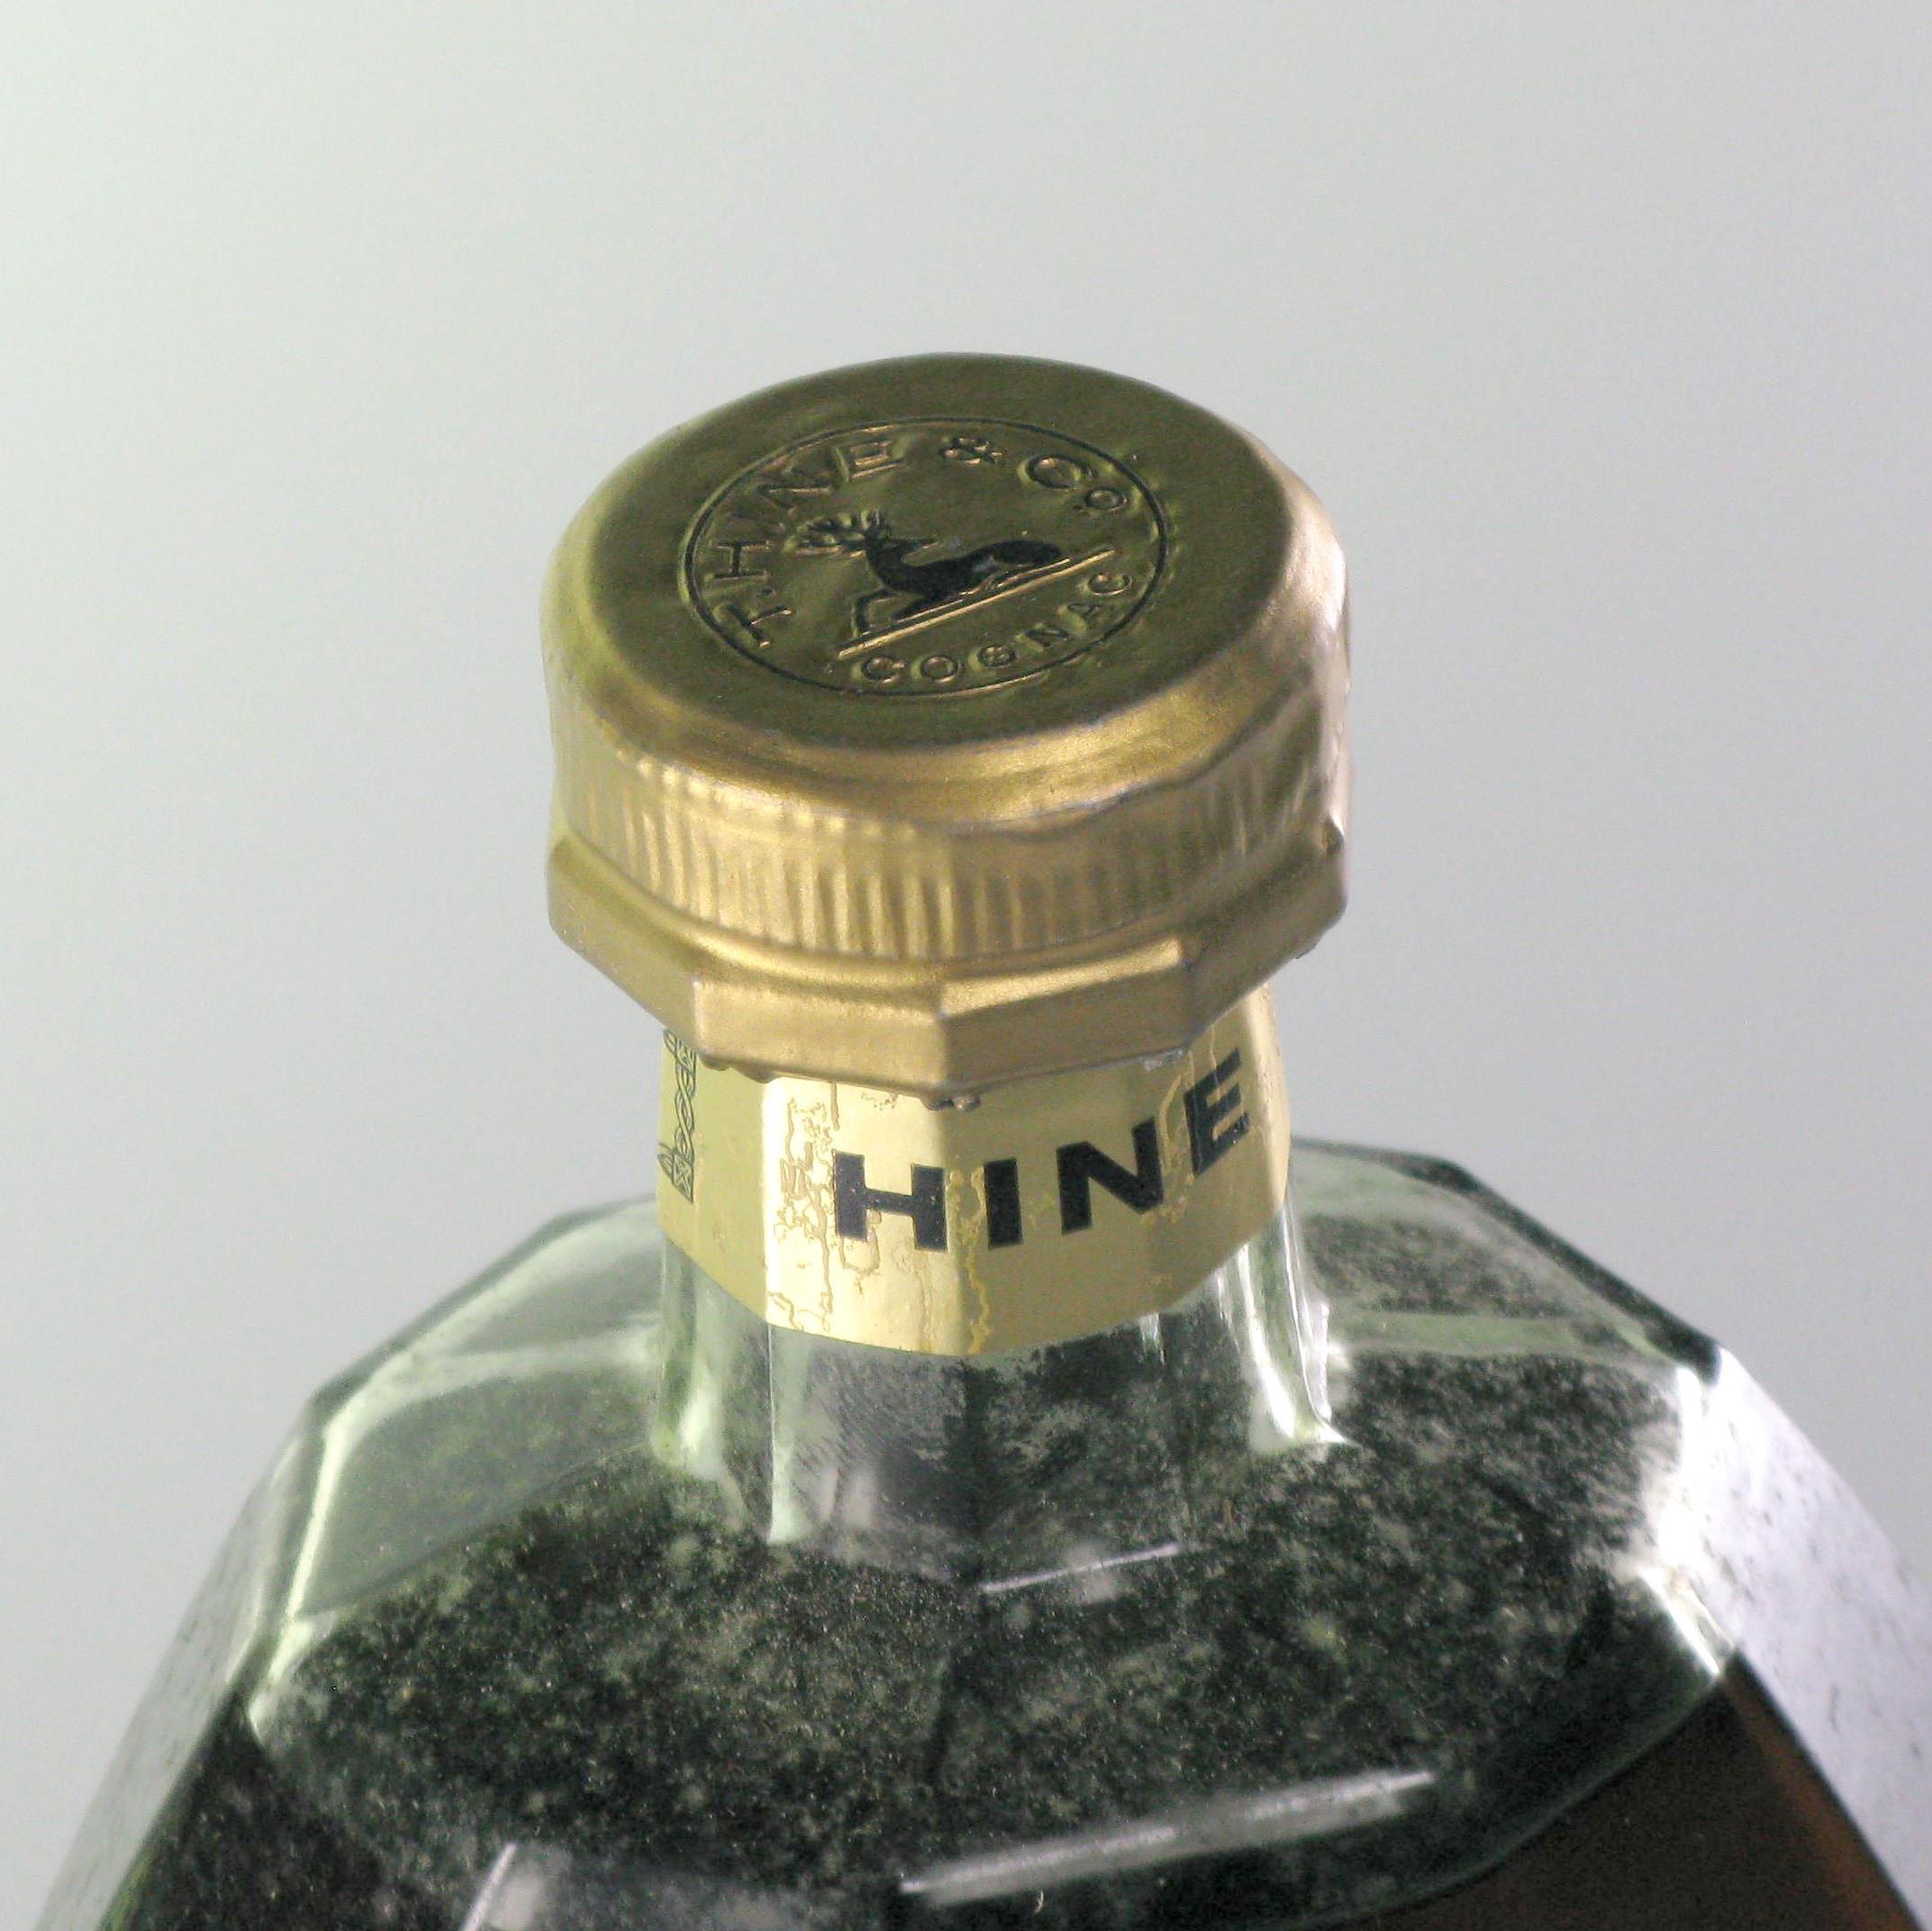 Cognac Hine Très Vieille Grand Champagne 1960s